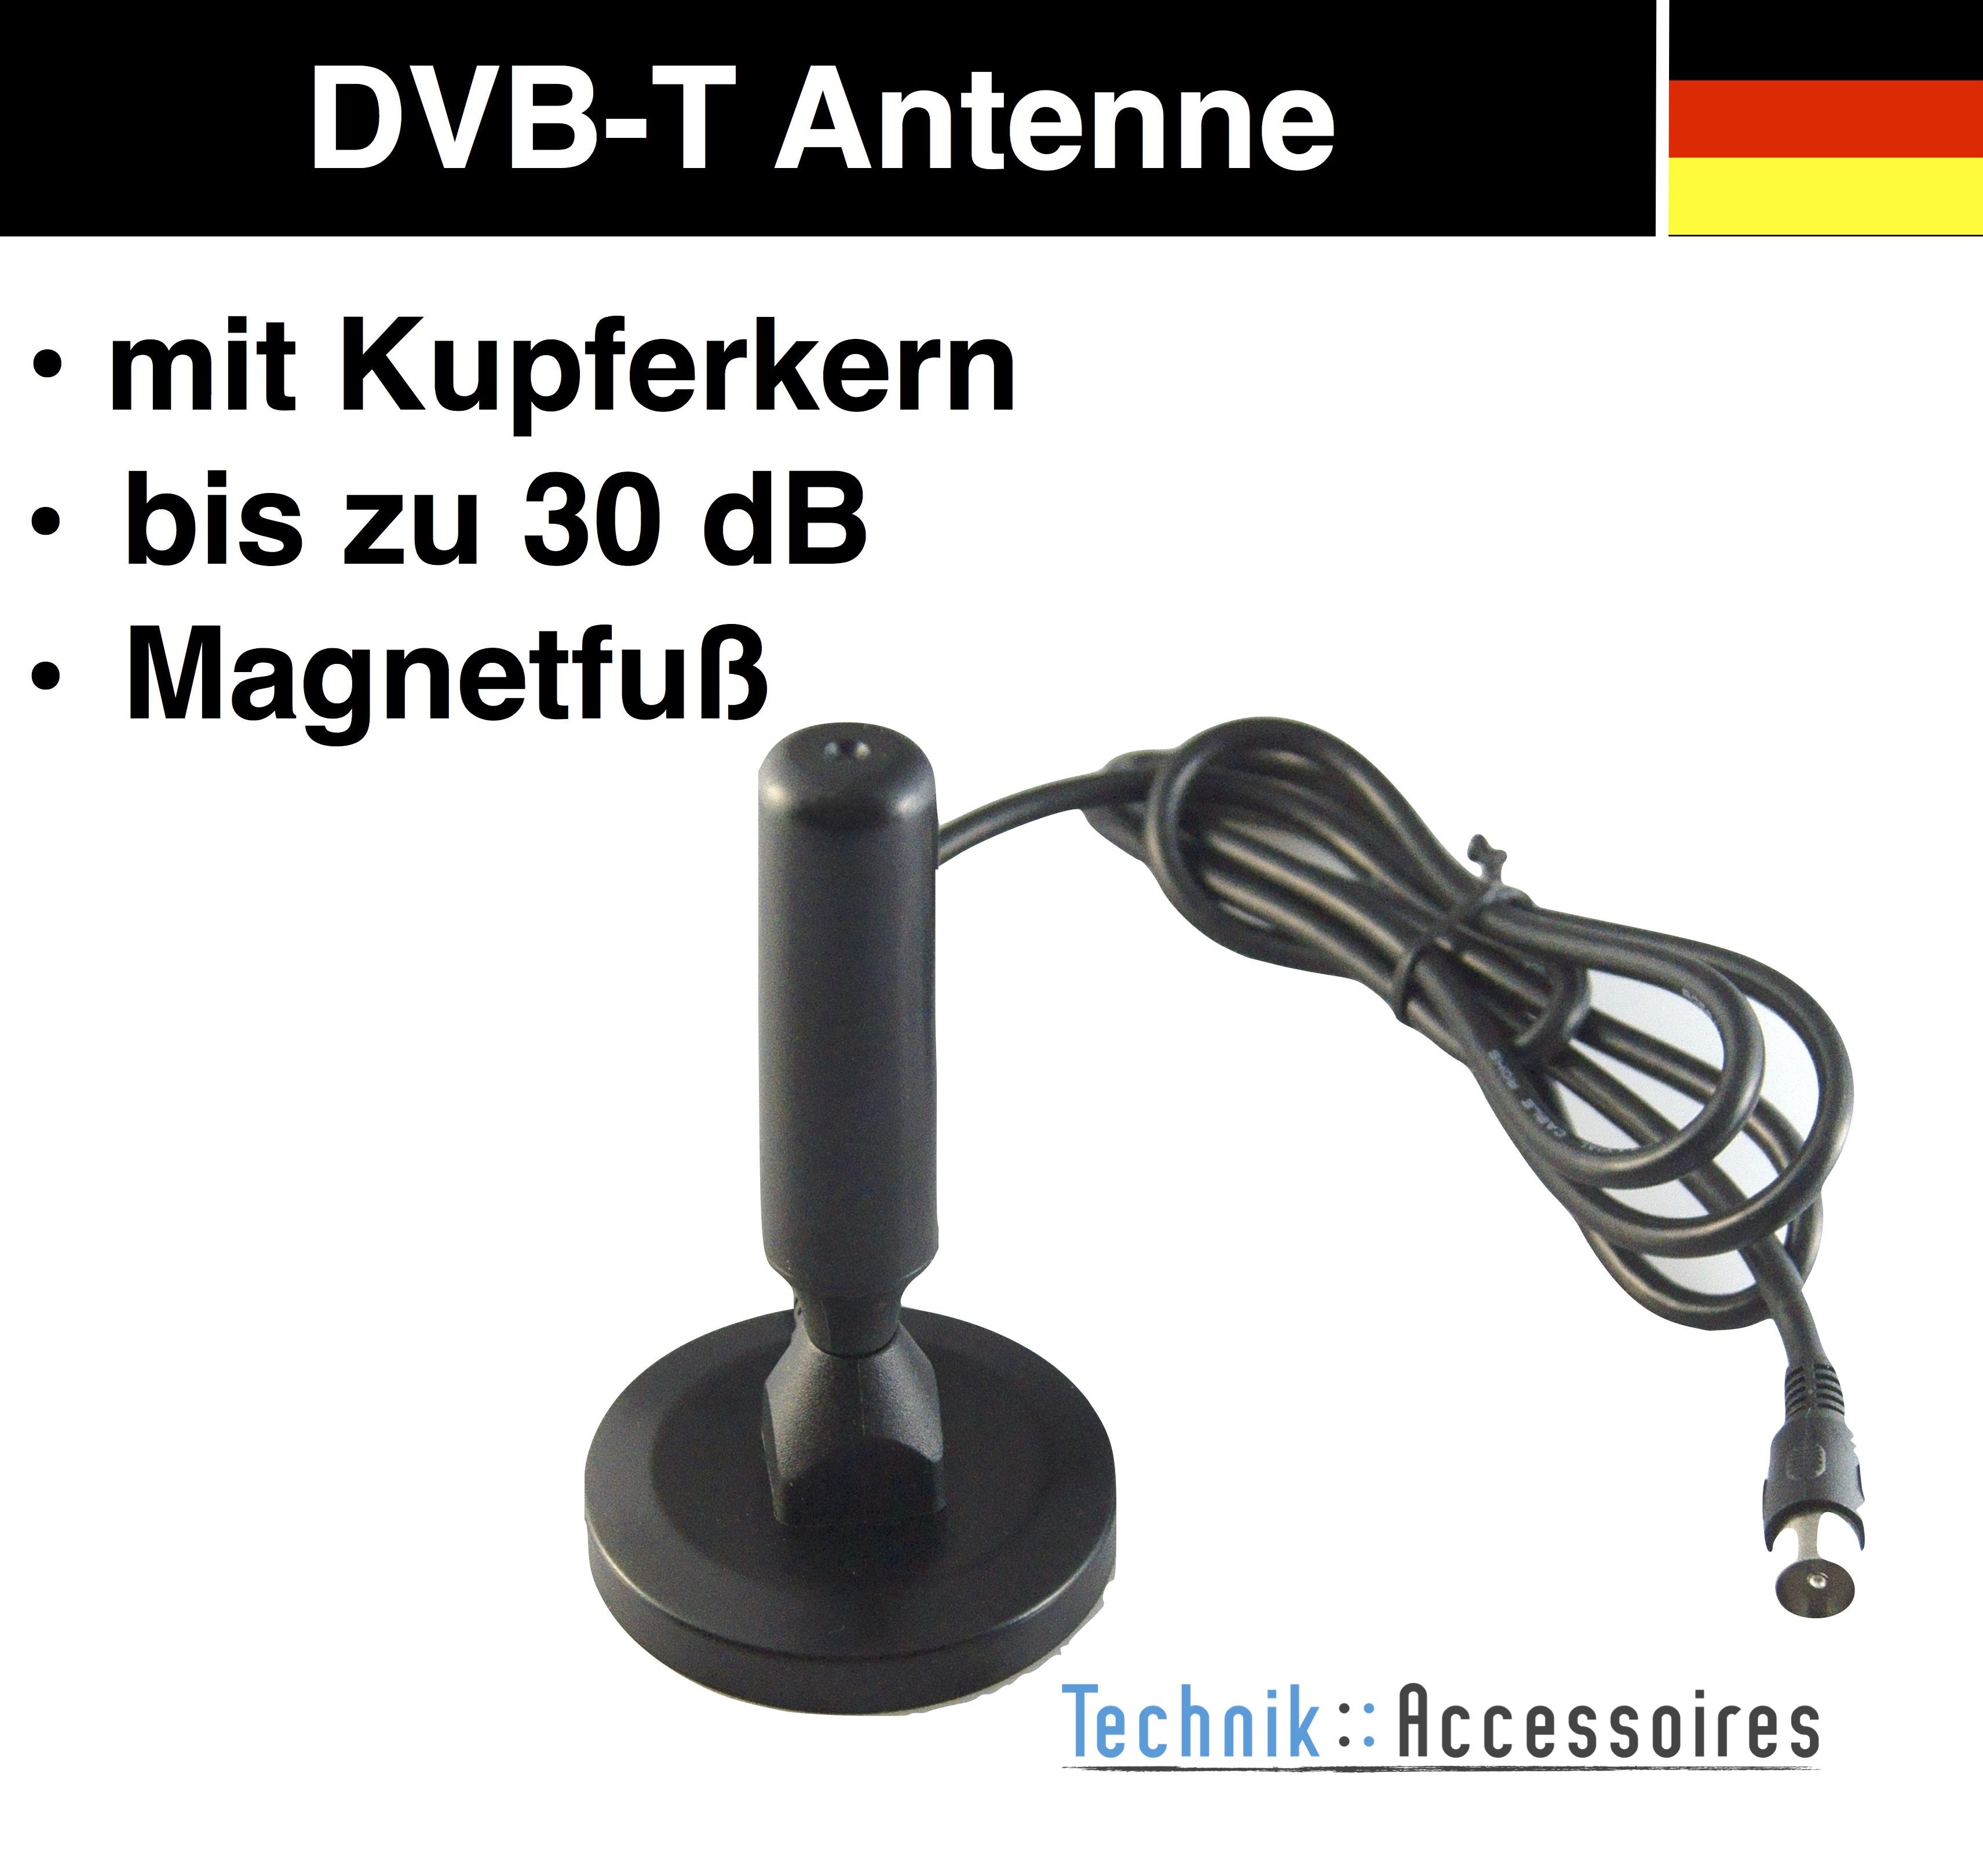 dvbt dvbt2 antenne stabantenne mit kupferkern f r lcd fernseher receiver tv ebay. Black Bedroom Furniture Sets. Home Design Ideas